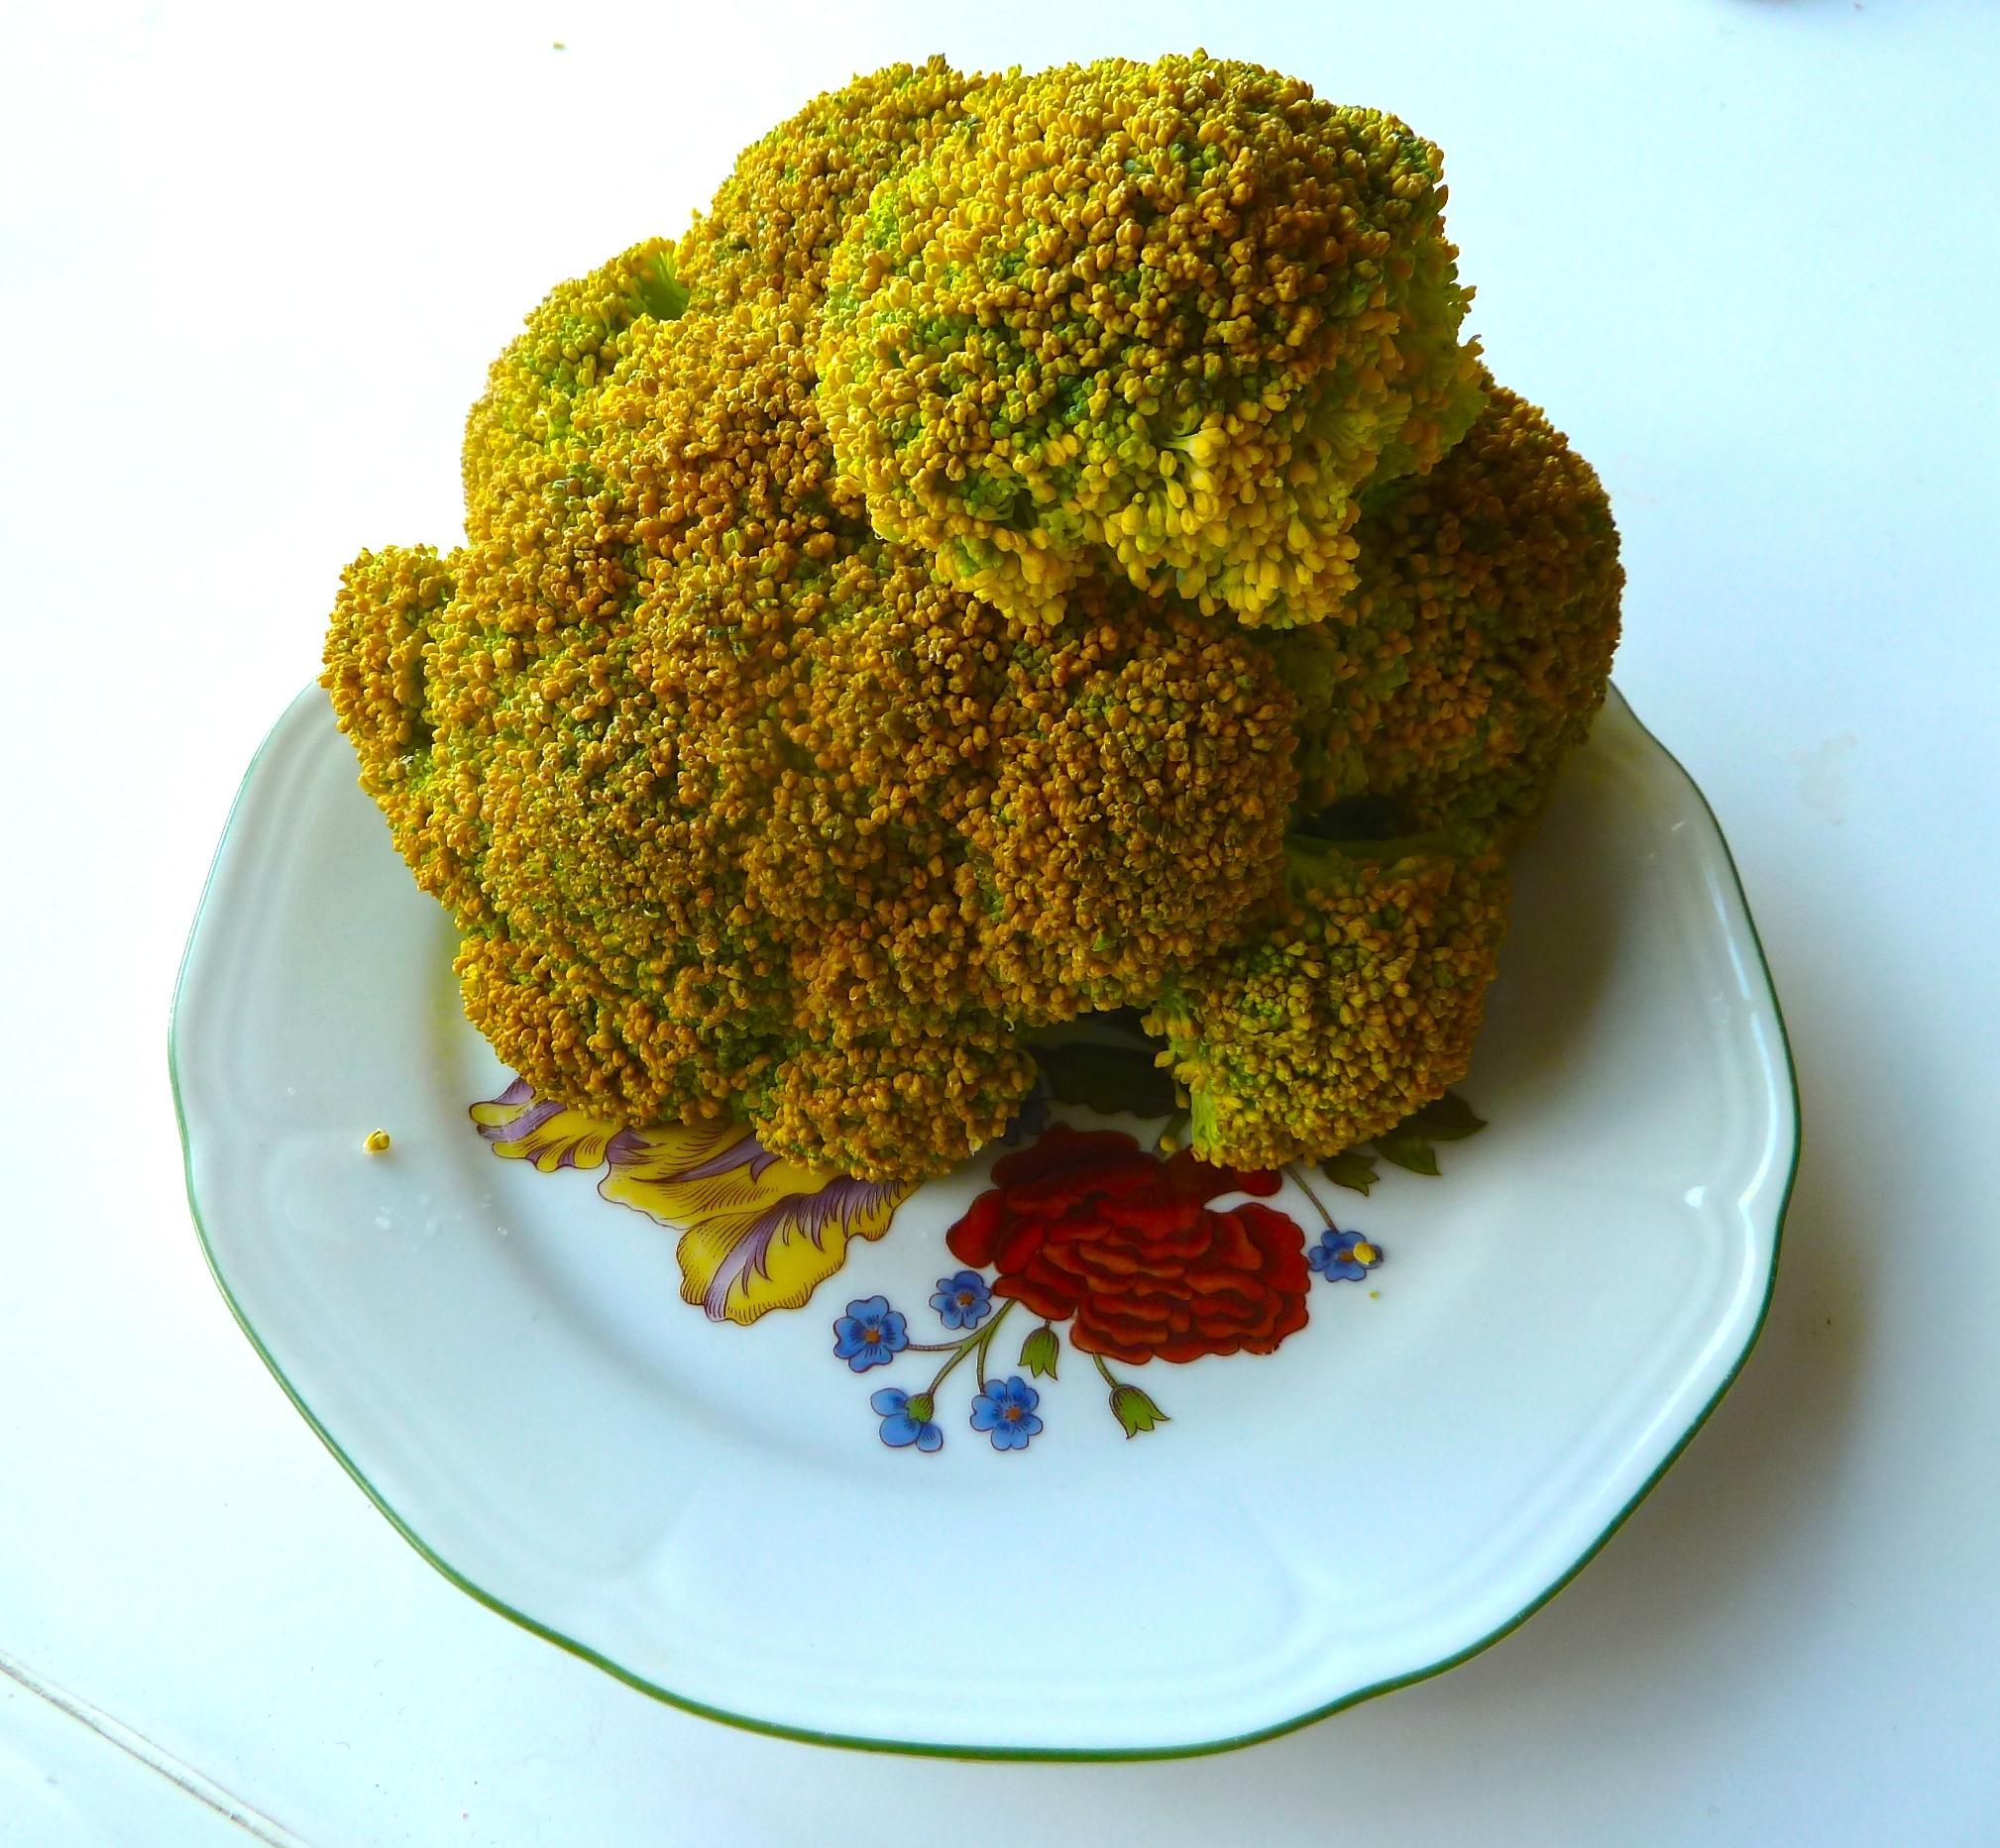 Even when the Broccoli is a bit yellow, it's still taste good!